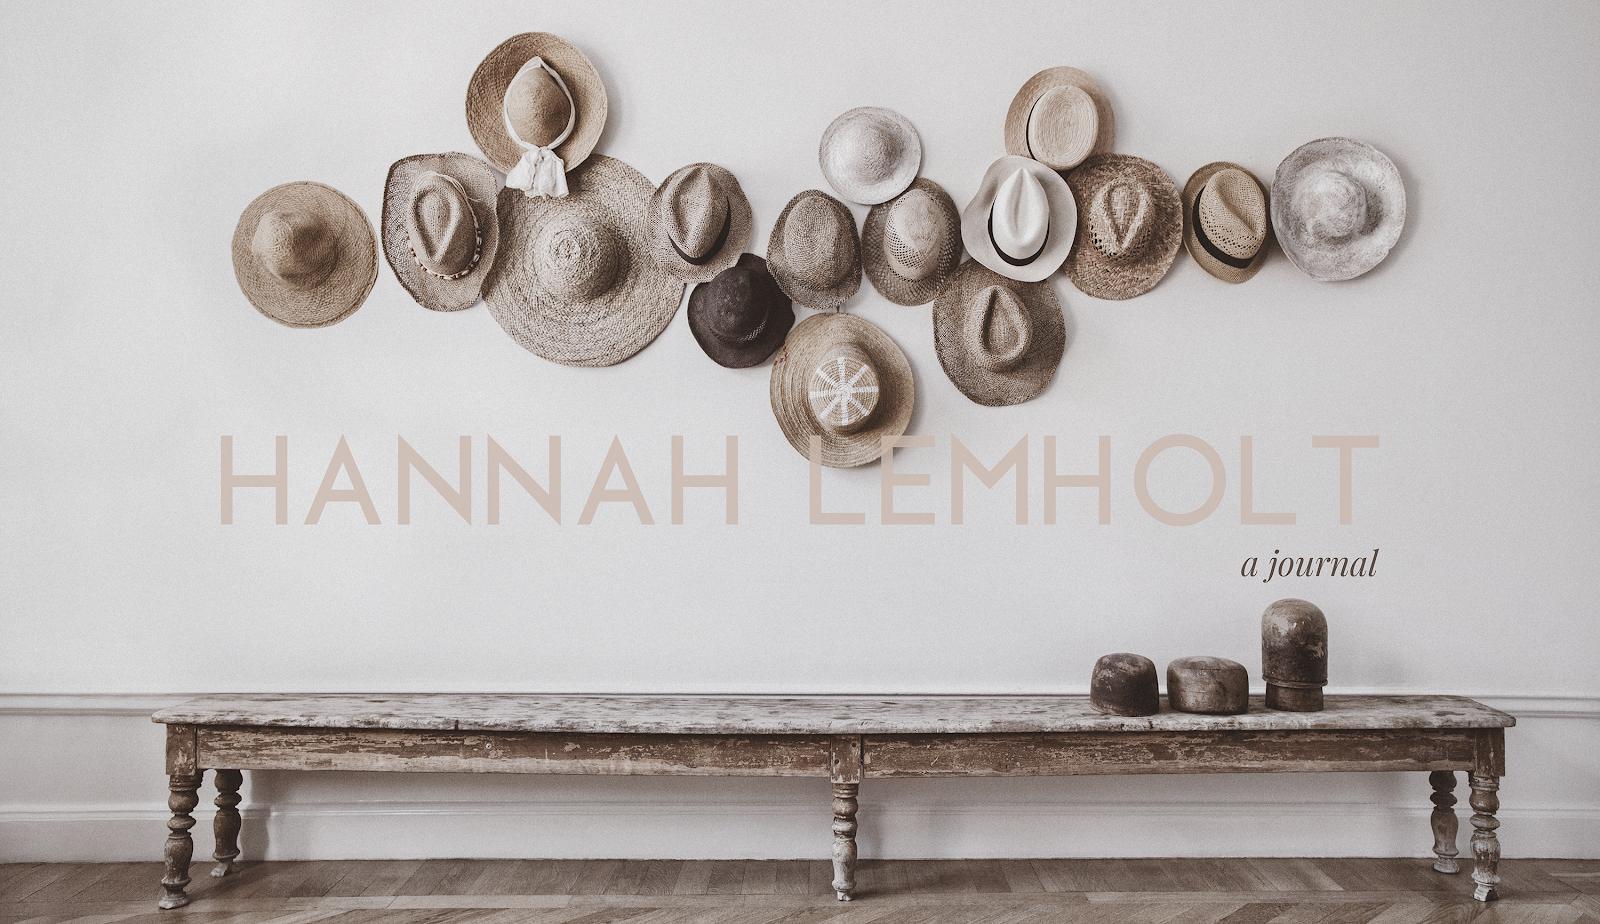 Hannah Lemholt